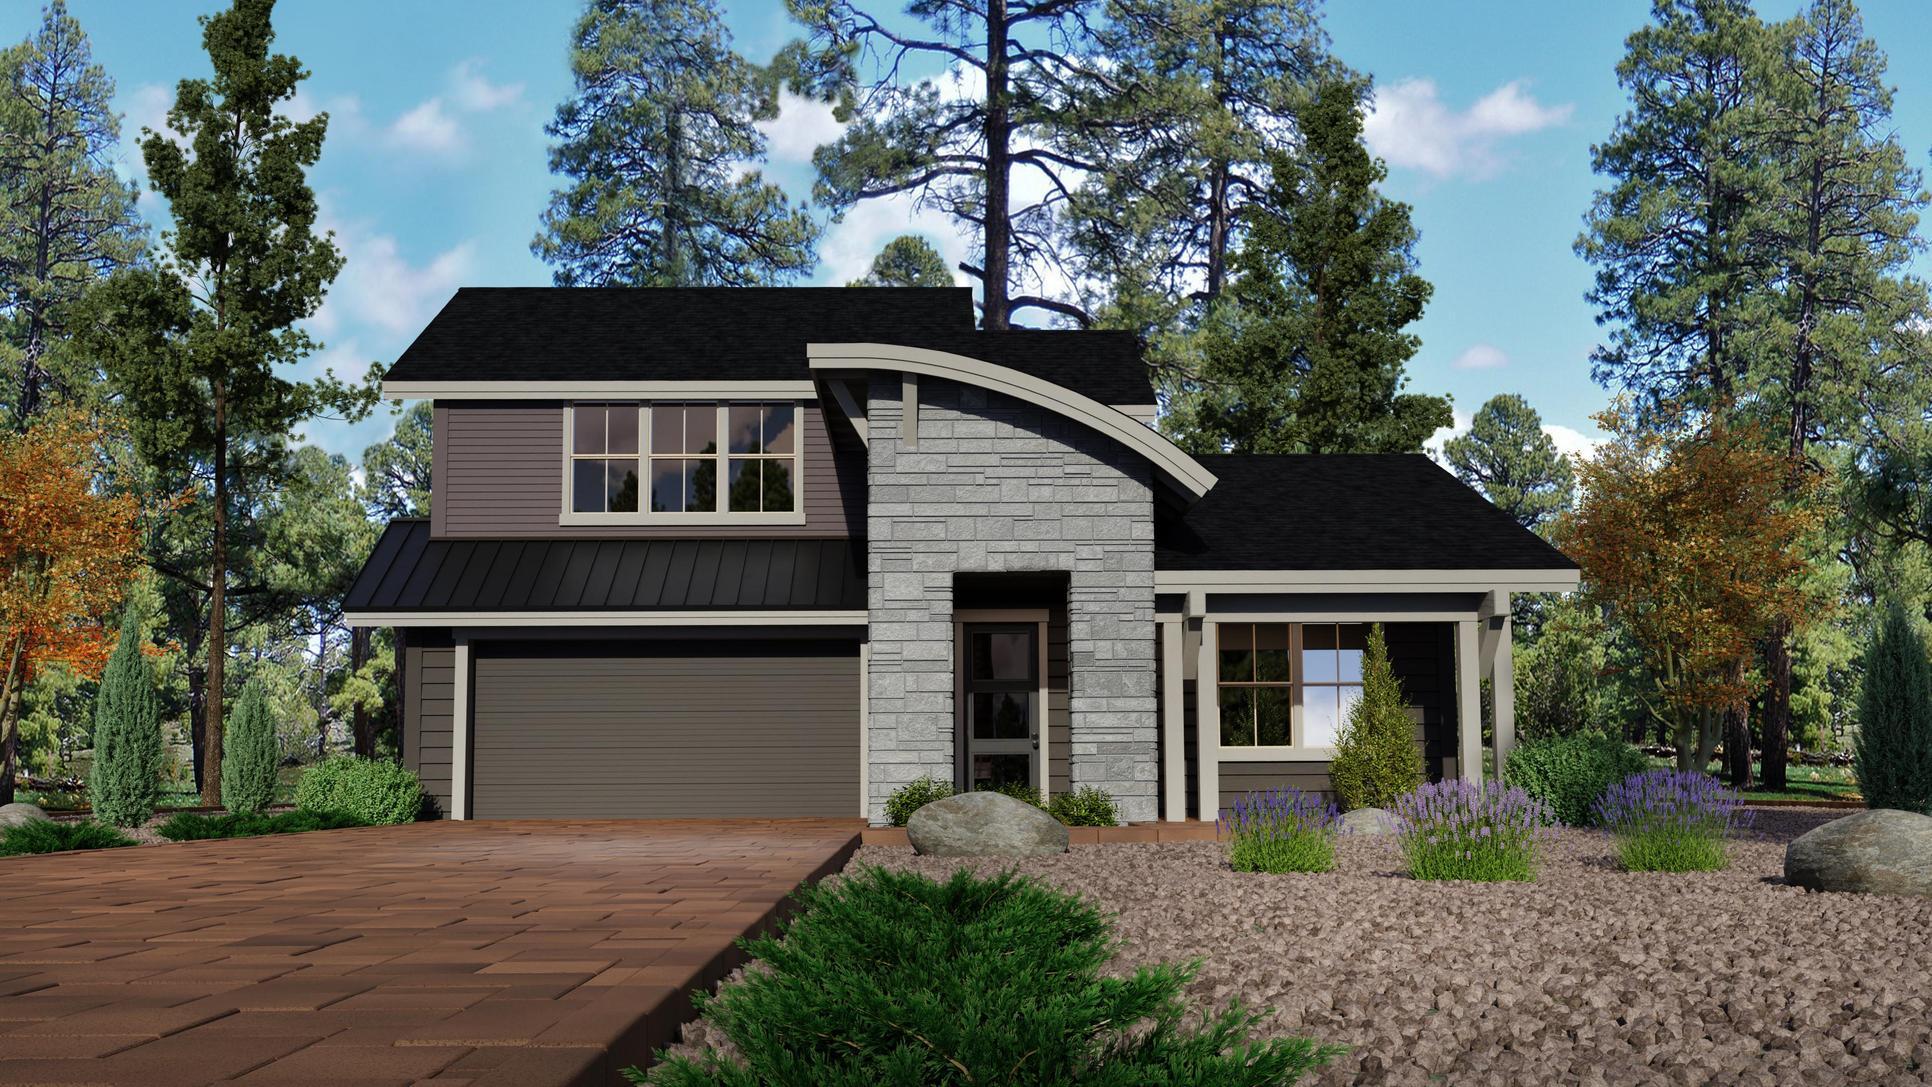 Timber Sky Plan 2882 Elevation C:Timber Sky Plan 2882 Elevation C